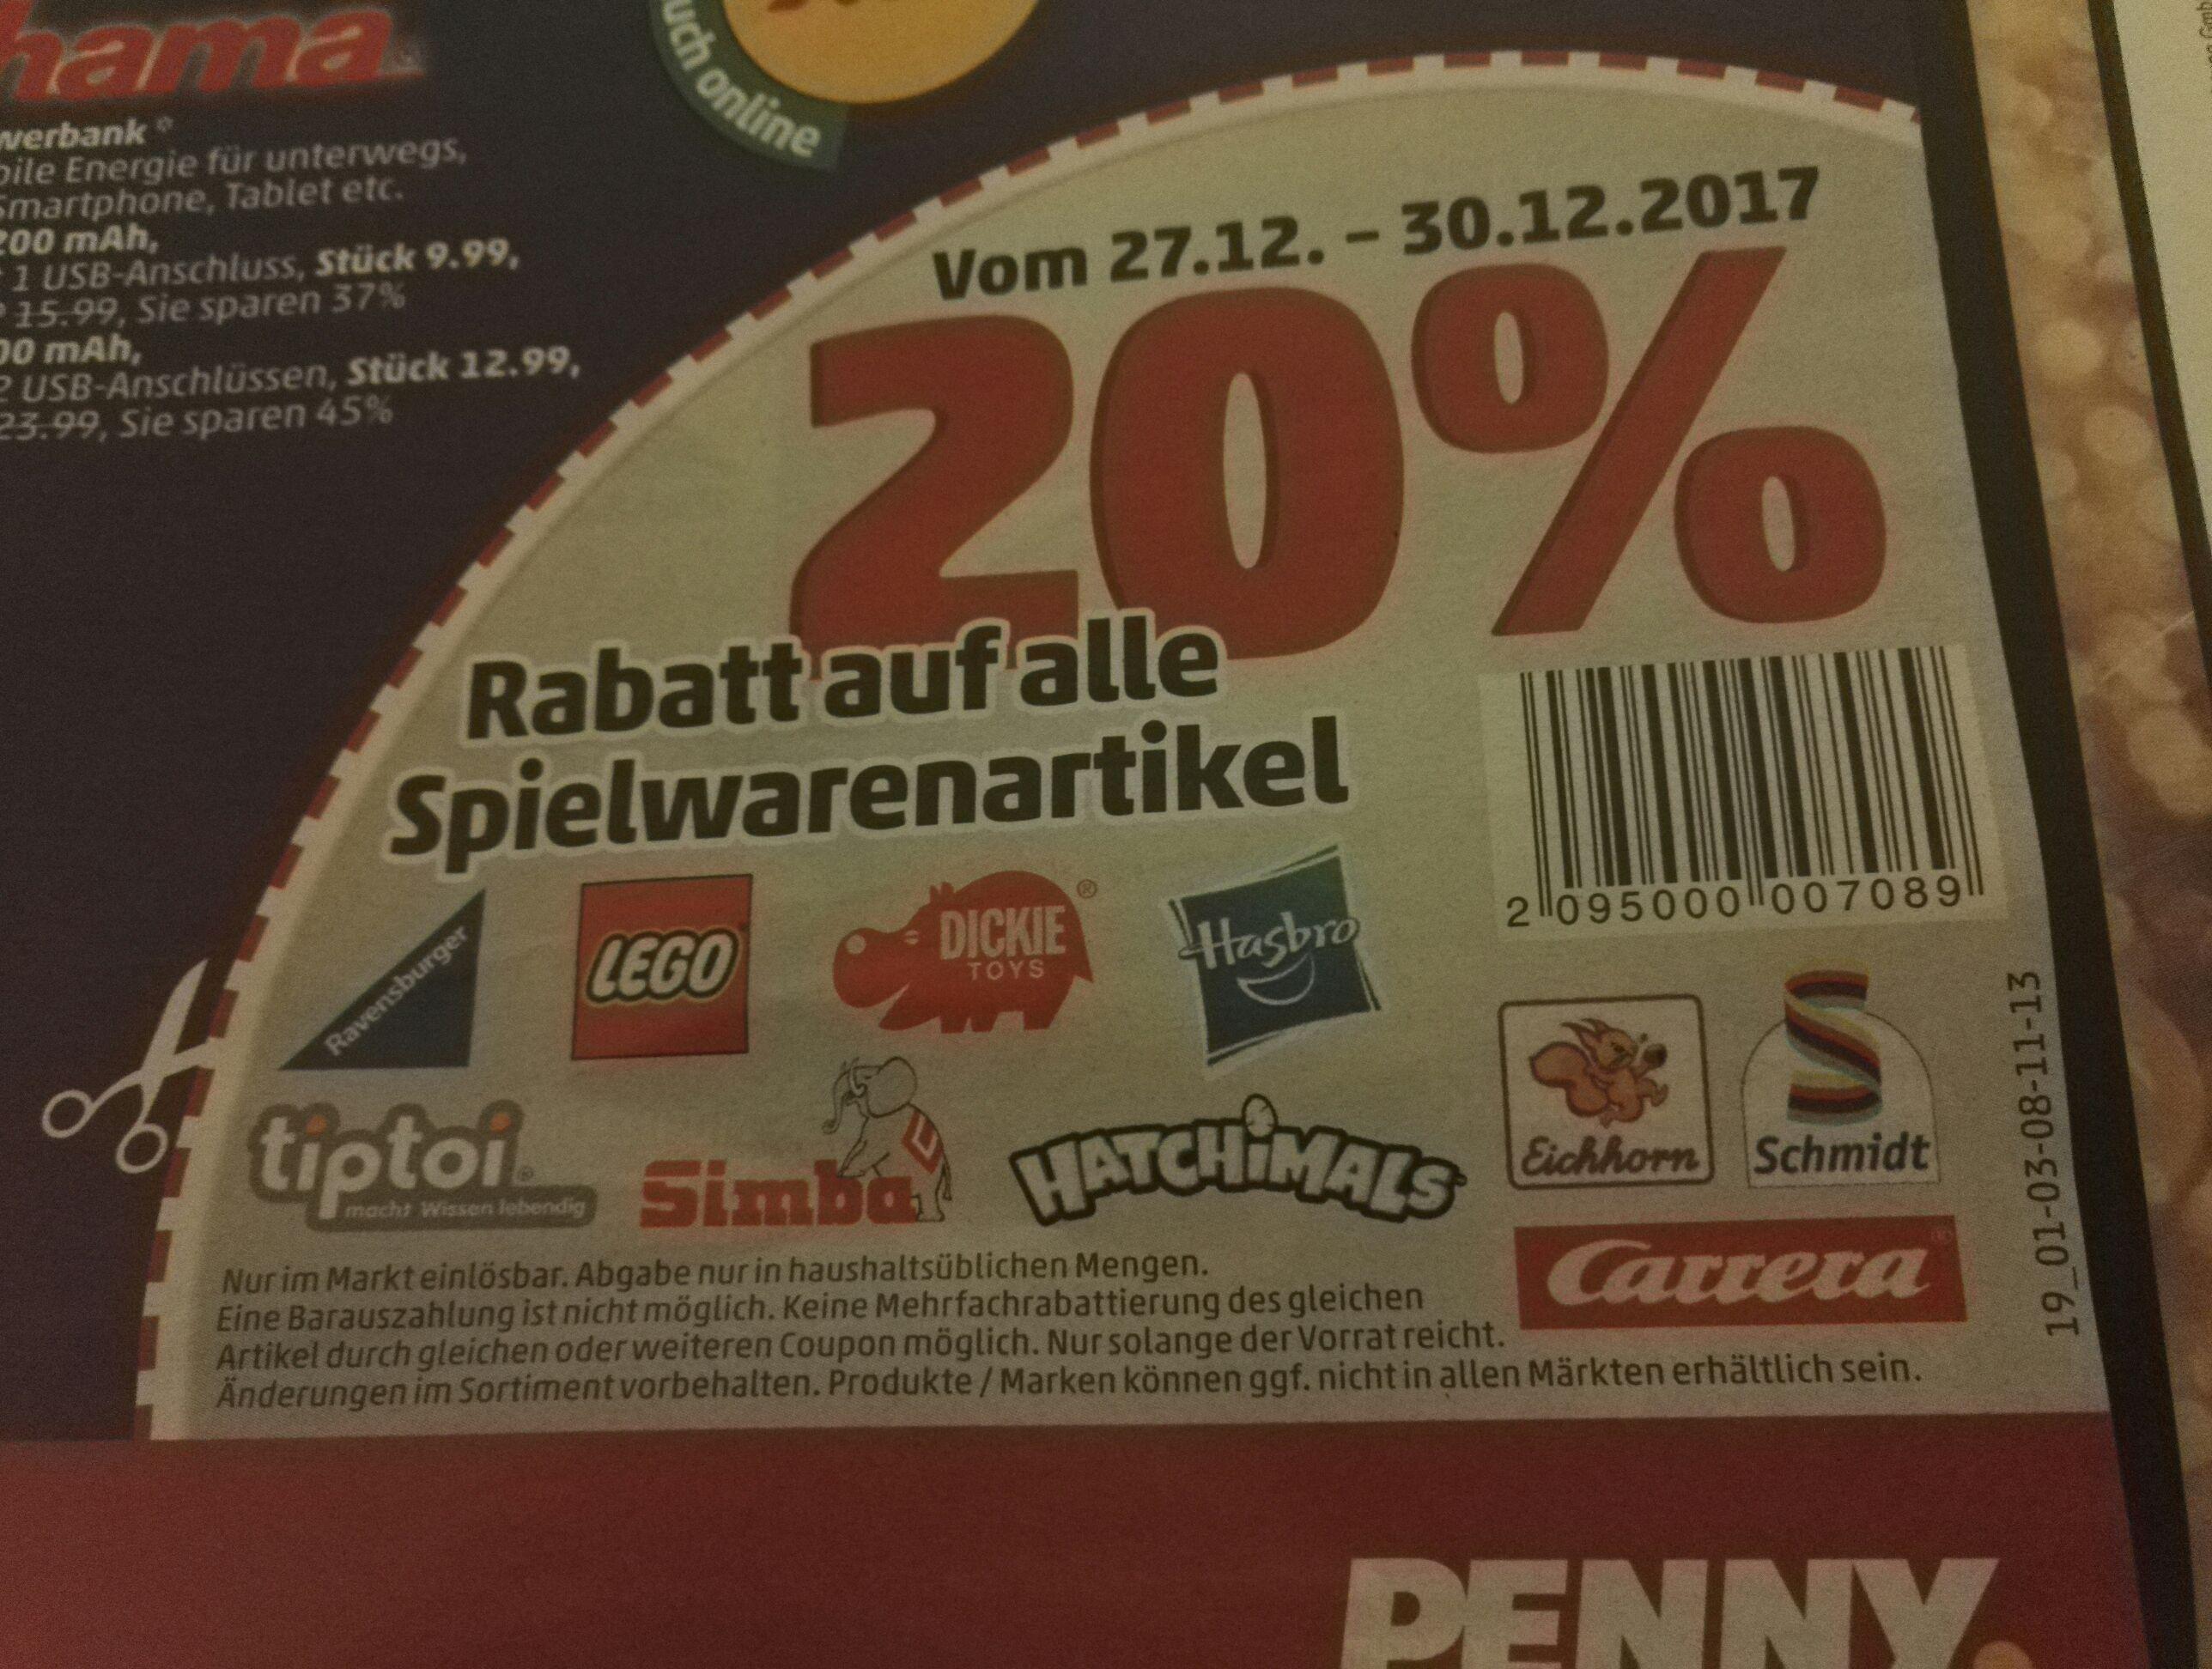 Last Minute 20% bei Penny auf Spielwaren evntl. Bundesweit